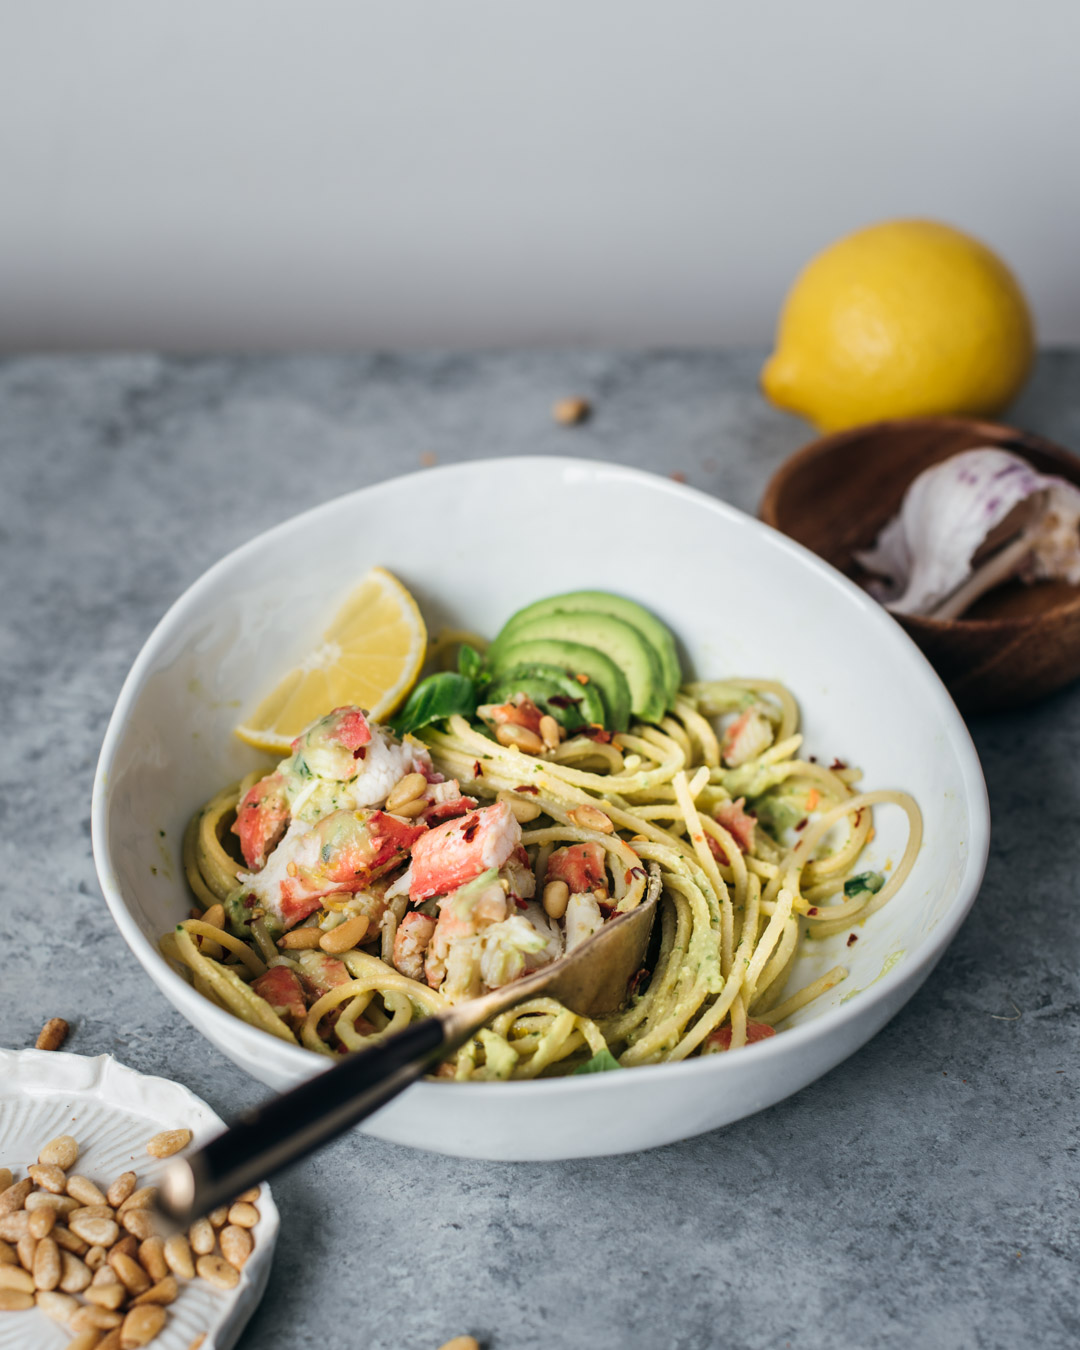 king crab avocado pesto pasta petrossian-0008-2.jpg